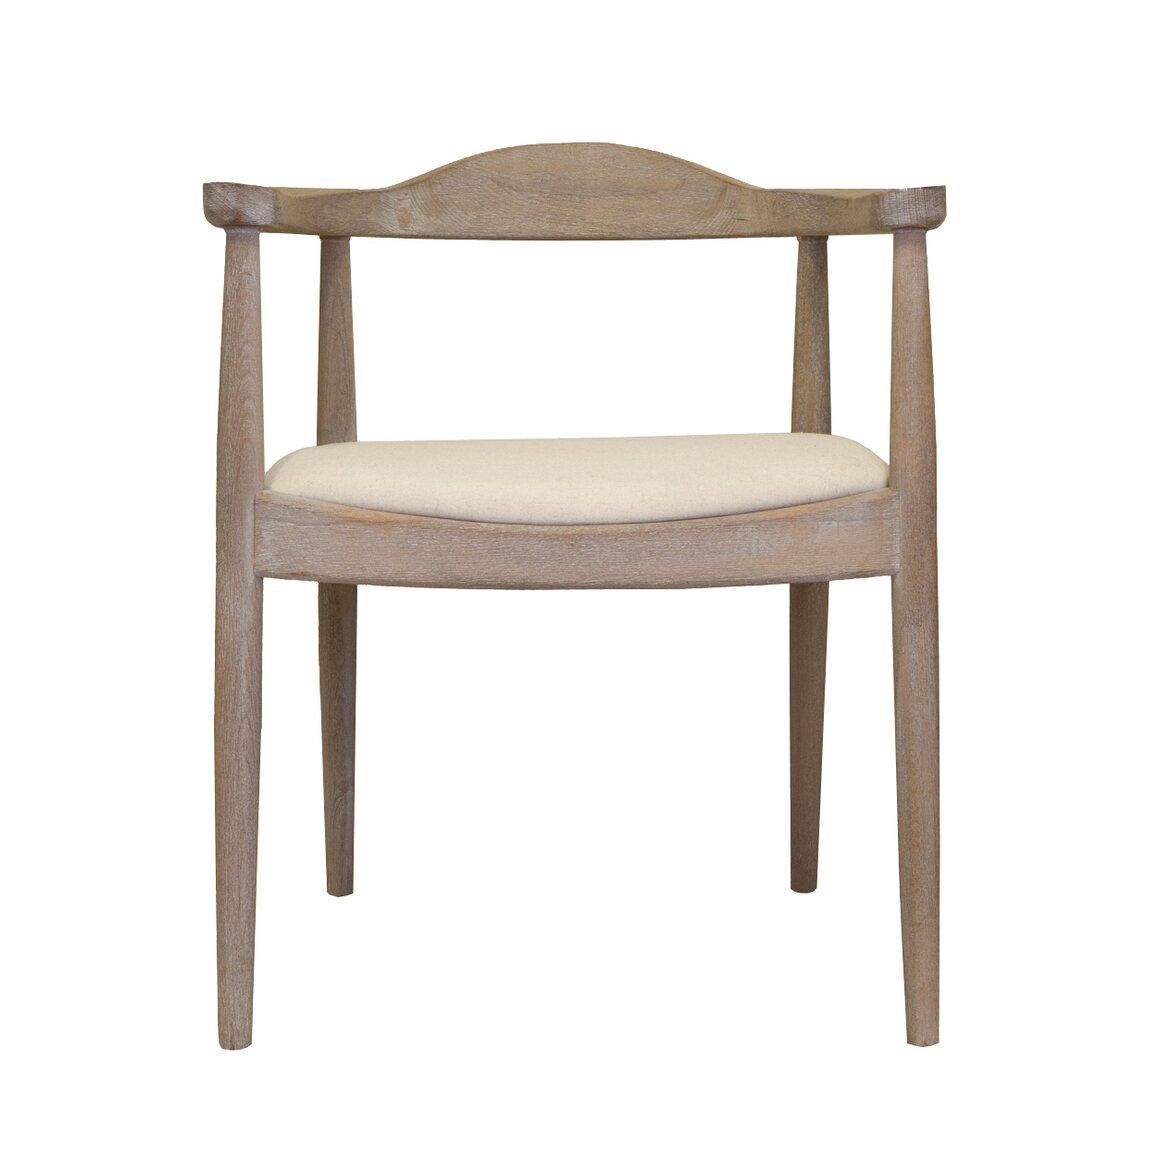 Стул Carlo old | Обеденные стулья Kingsby